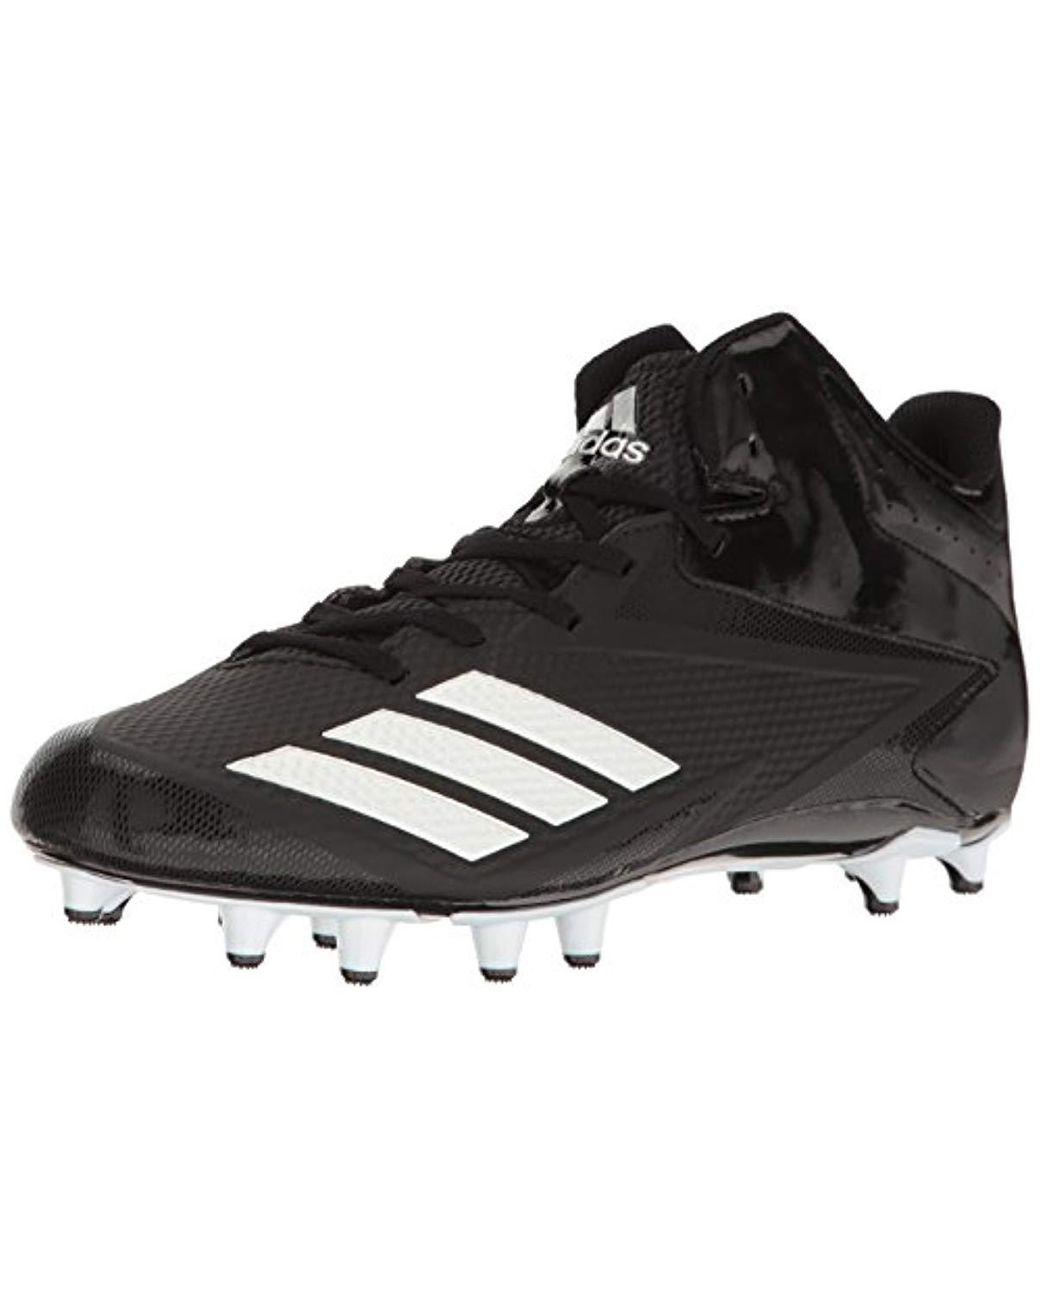 b1b0d92cb9d Lyst - adidas Freak X Carbon Mid Football Shoe in Black for Men